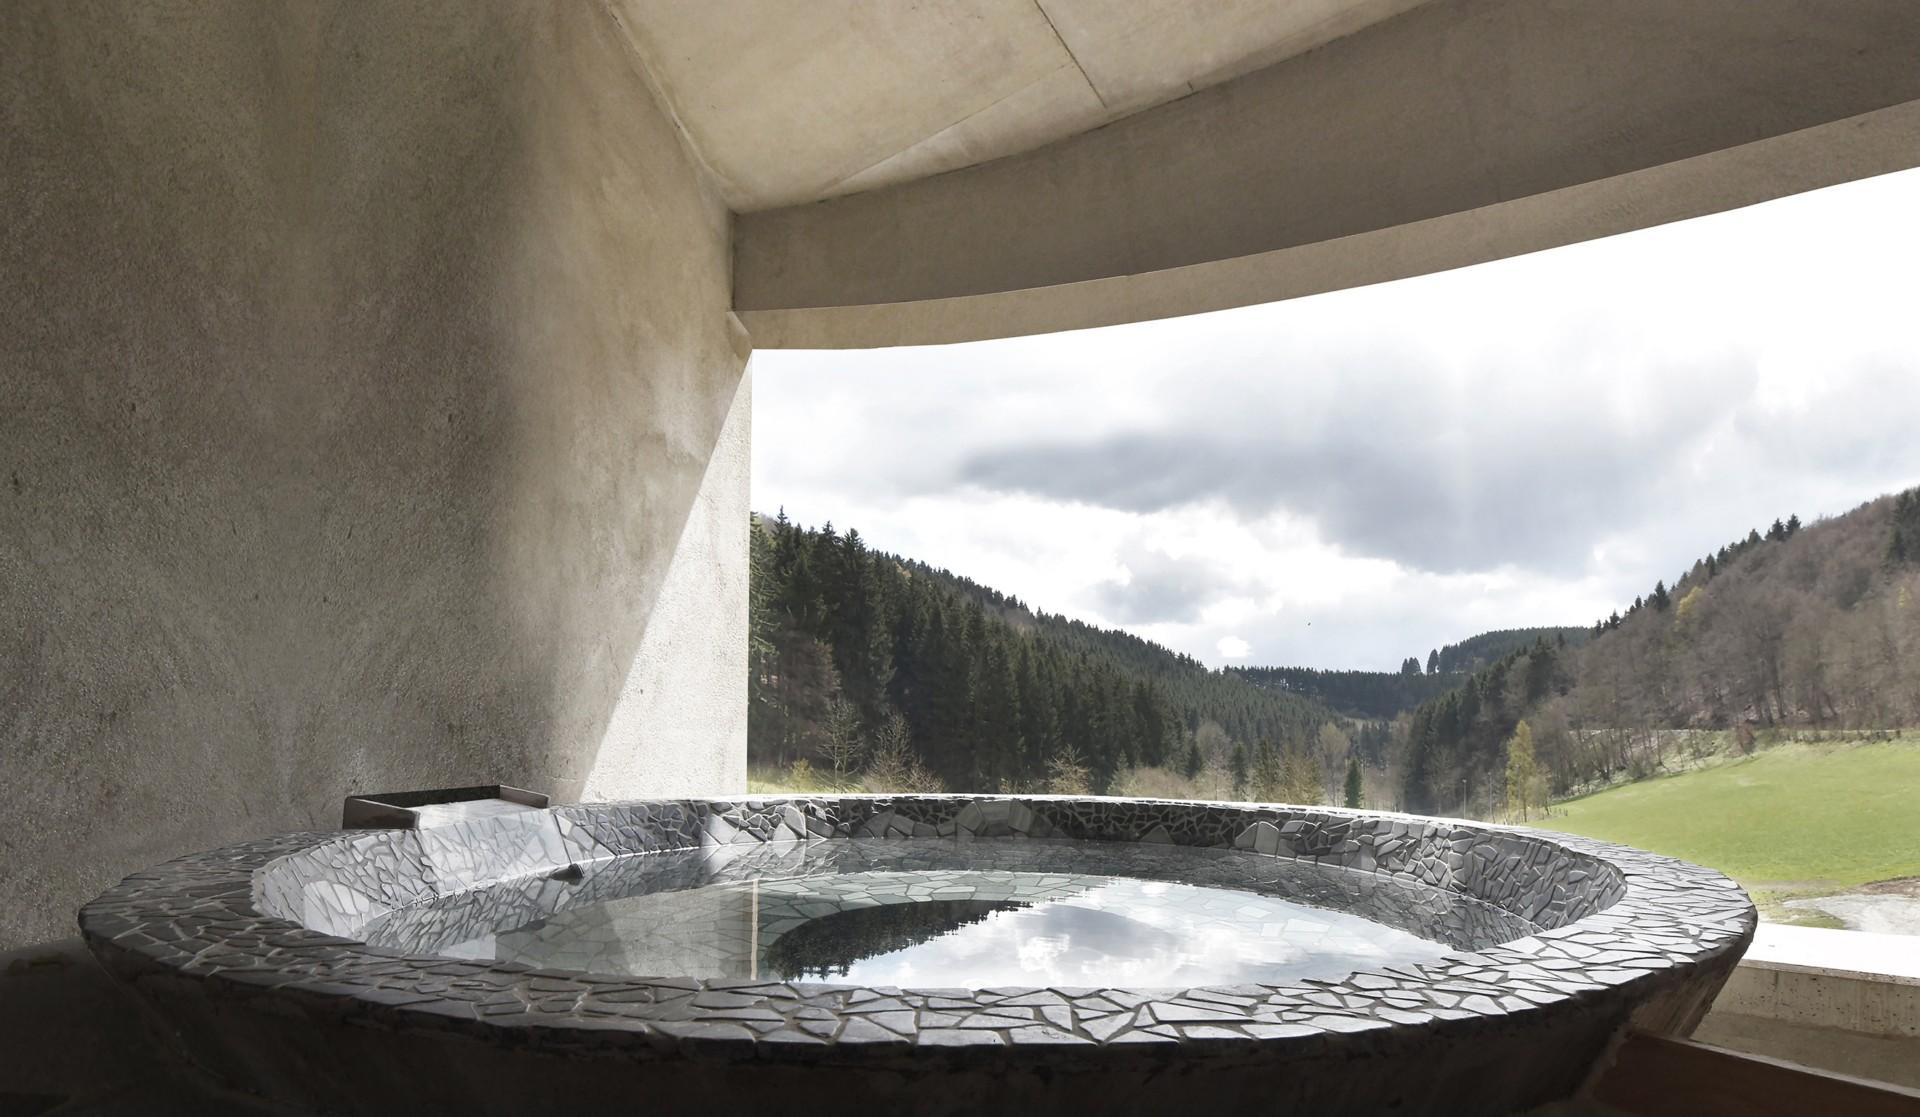 Architektur Galerie Berlin SATELLIT mostra Vita contemplativa